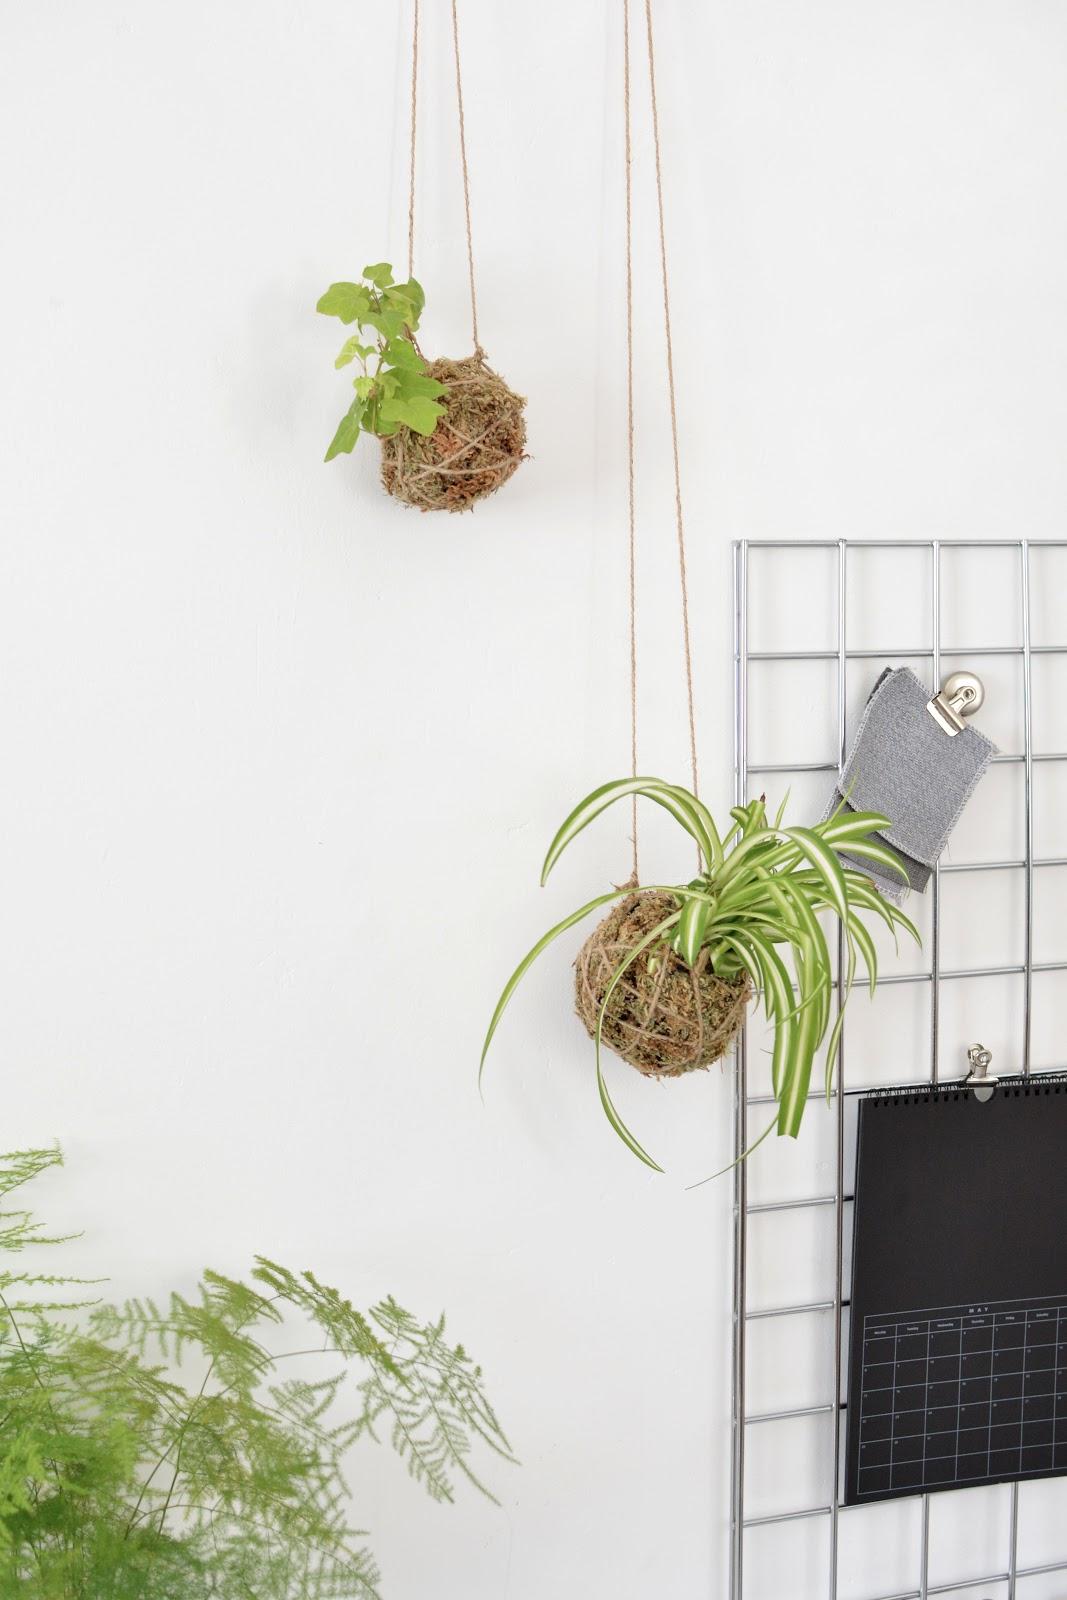 string garden project, gardening, urban garden, succulents